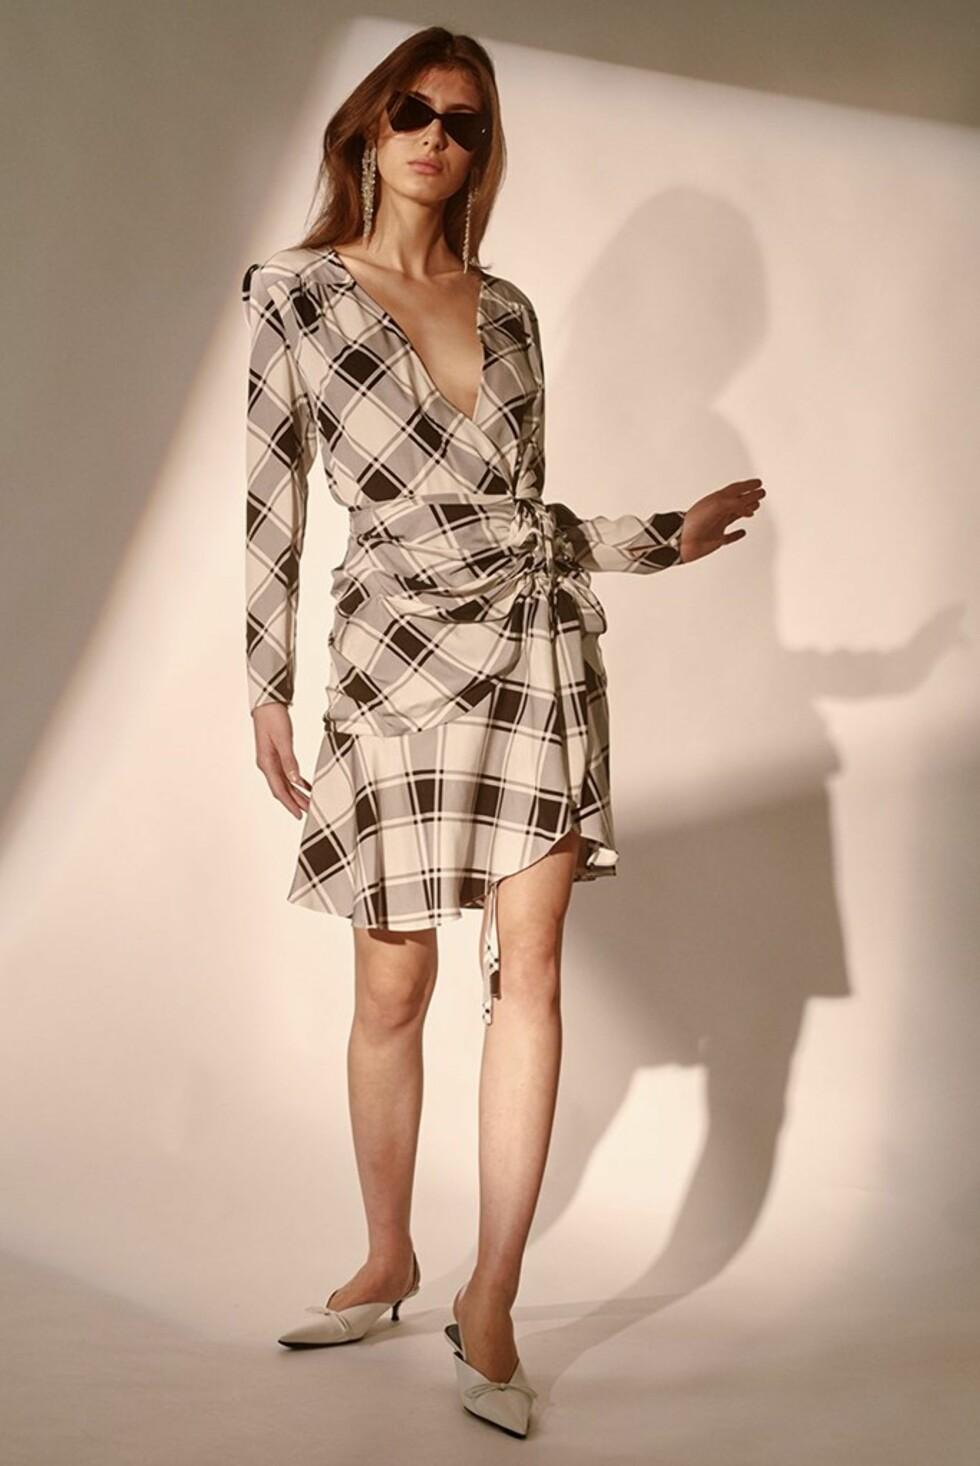 Kjole fra Style Mafia |1215,-| https://stylemafia.us/collections/new-arrivals/products/emama-dress-plaid-wrap#.WzNoOFUzbRZ